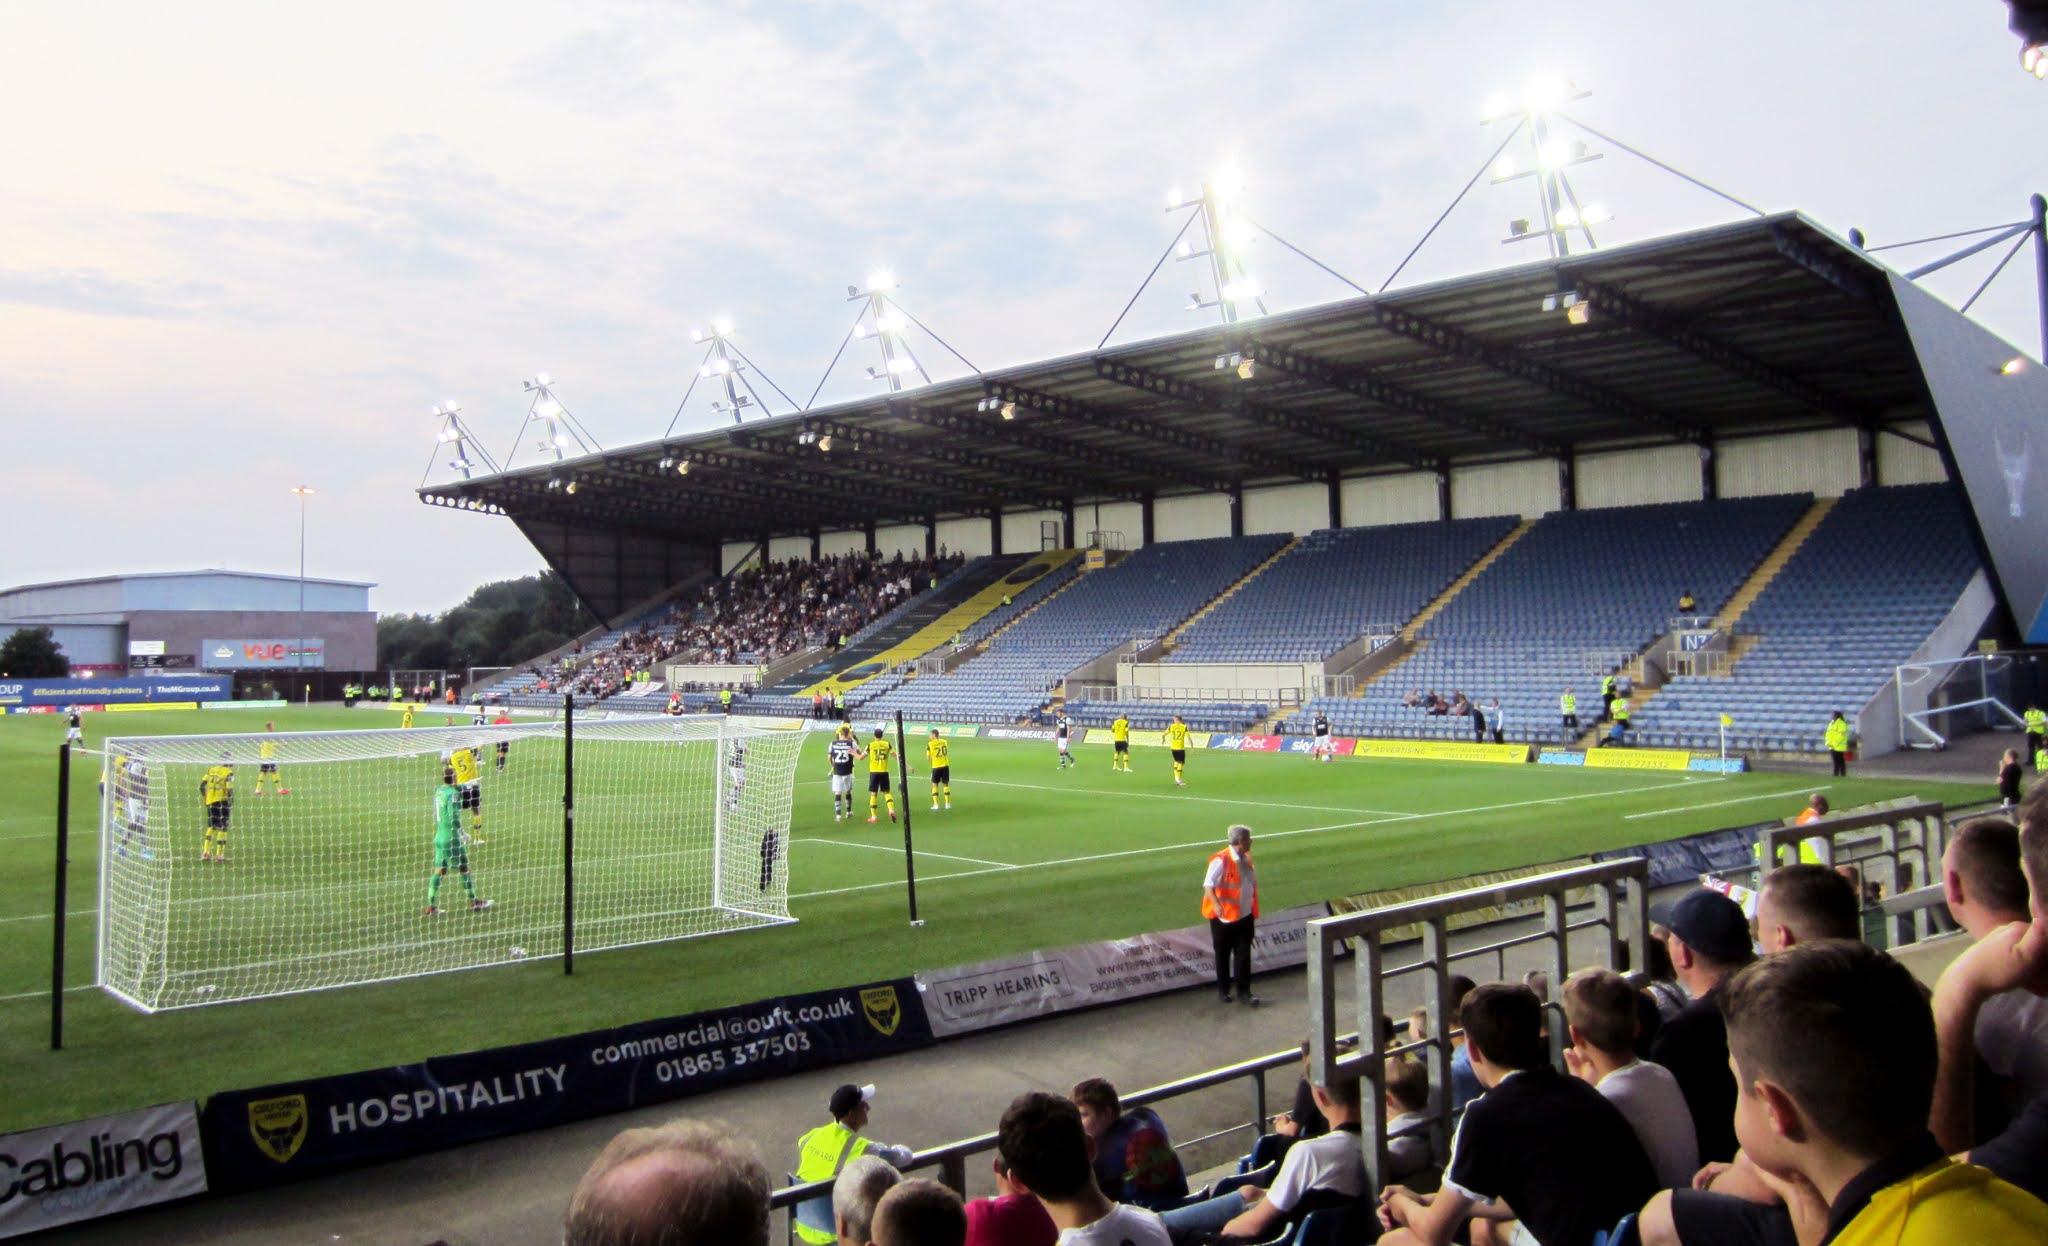 North stand at The Kassam Stadium